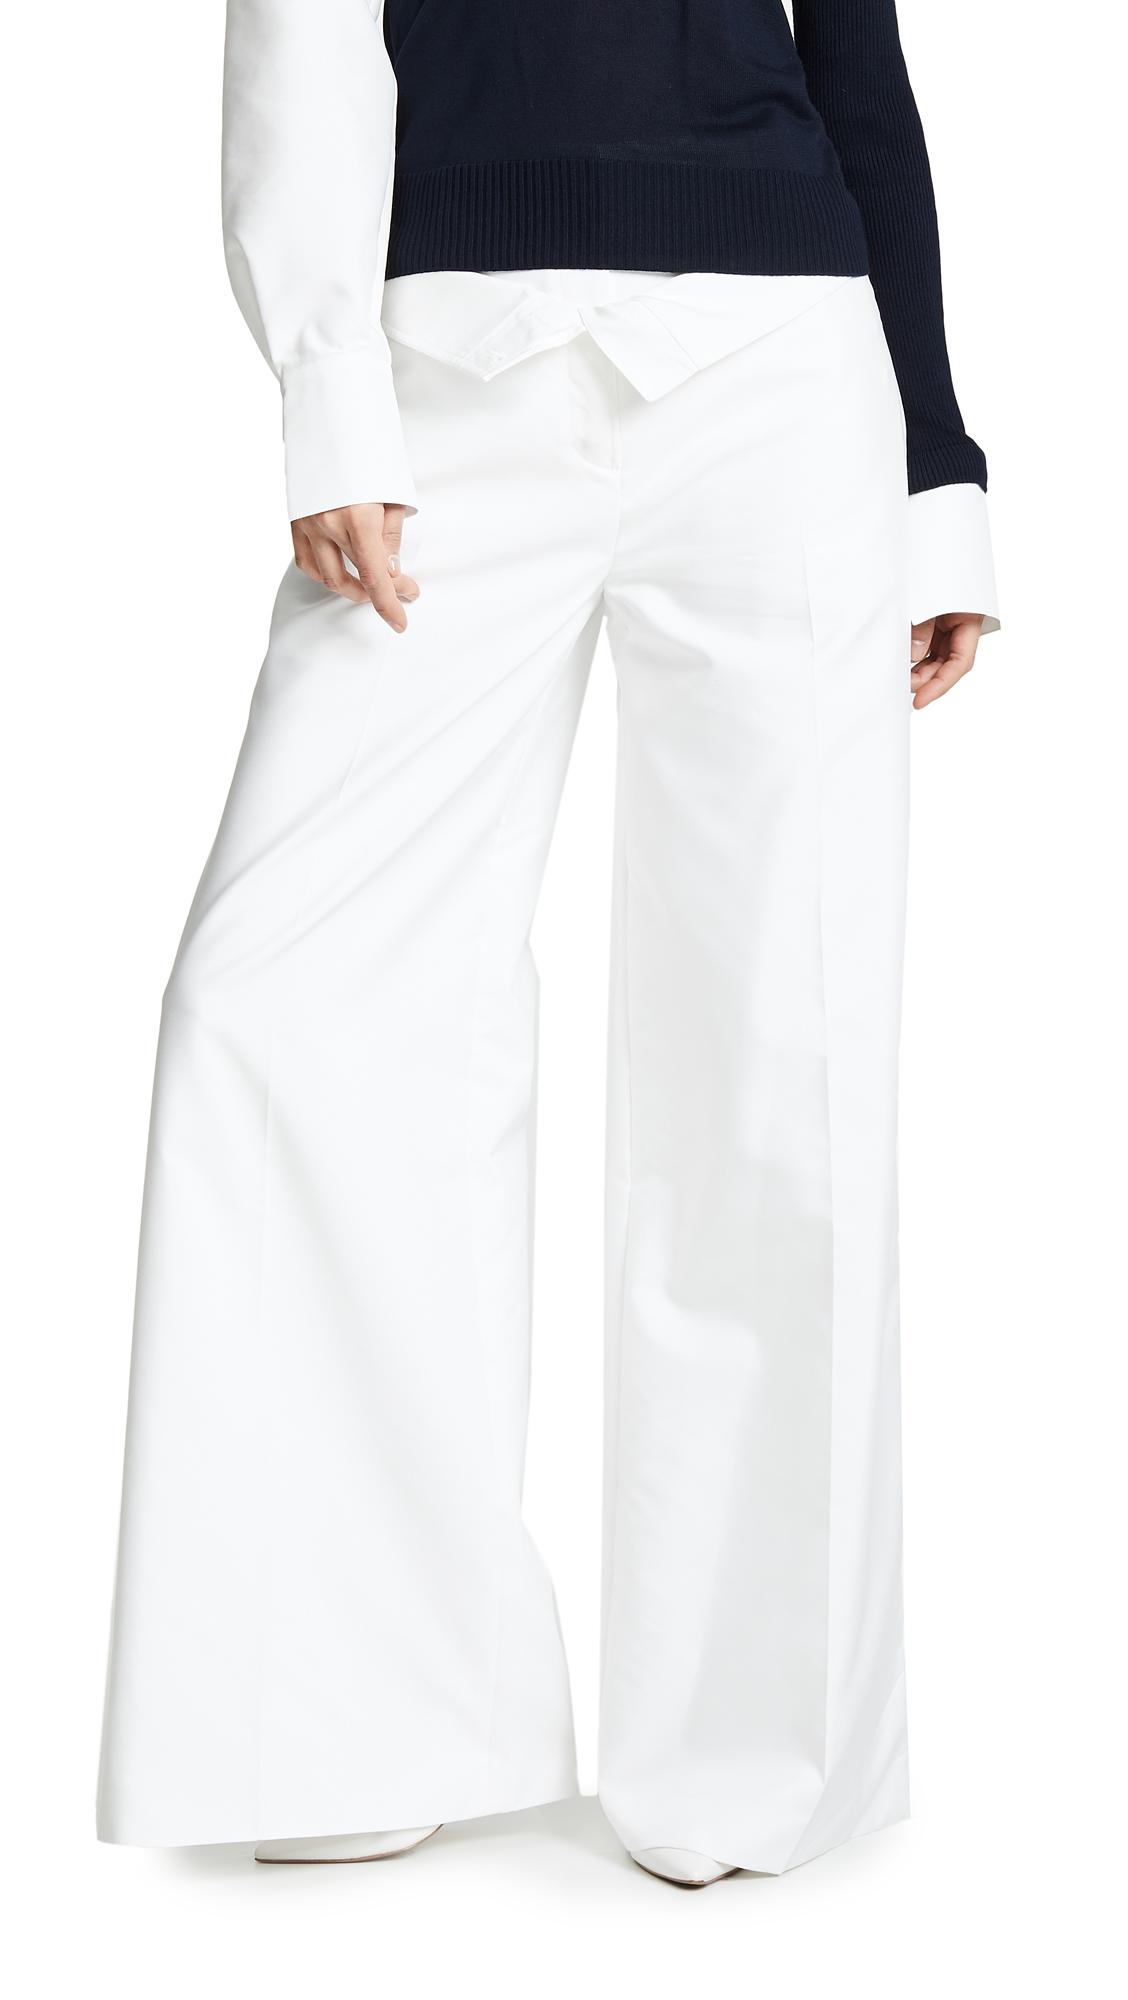 Adeam Double Waistband Trousers - White